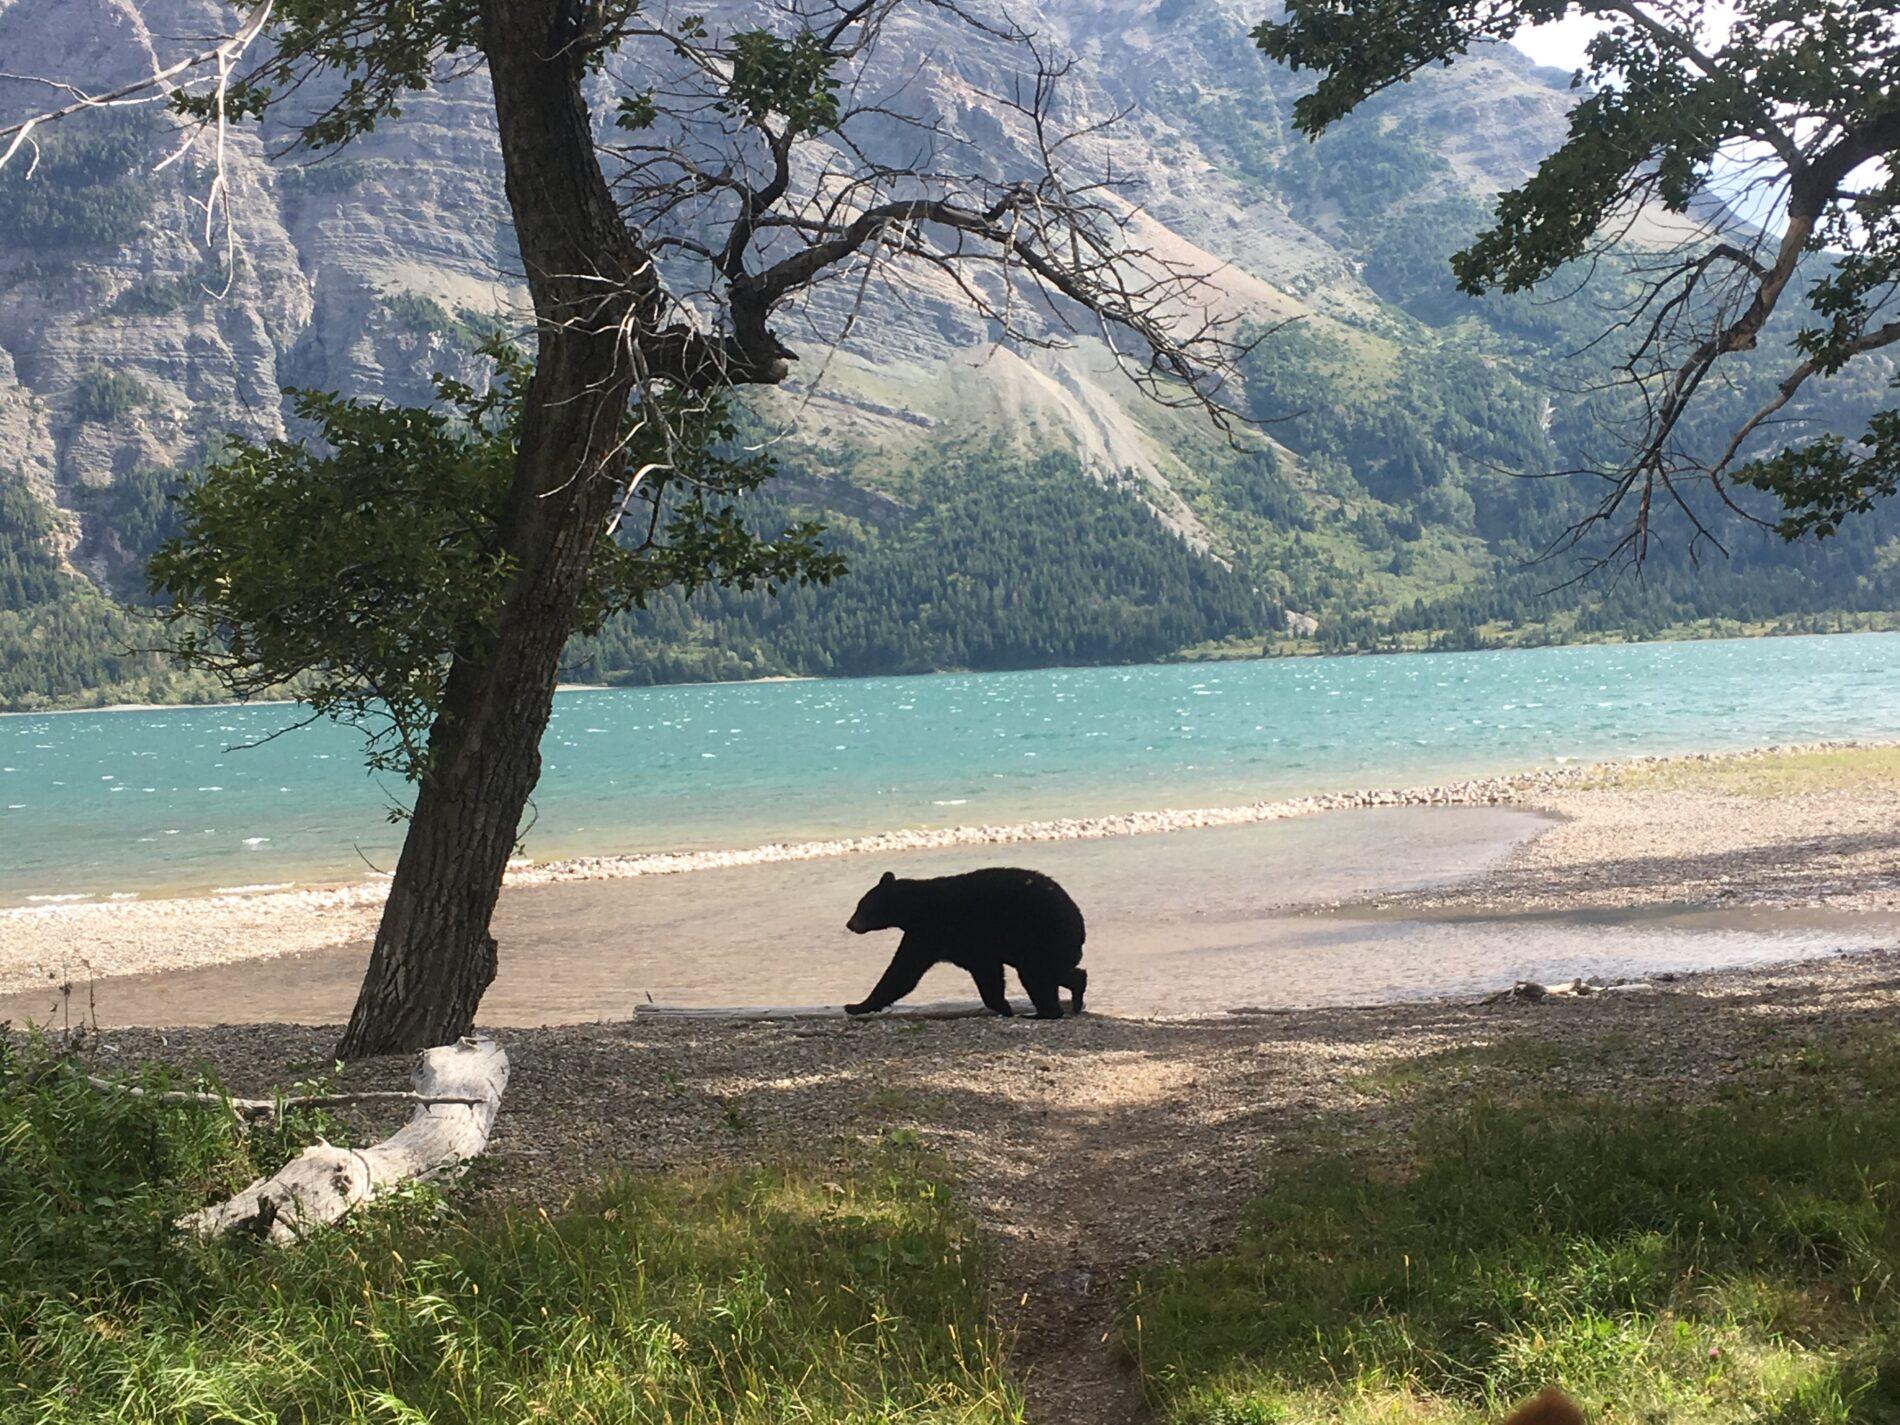 bear on lakeshore